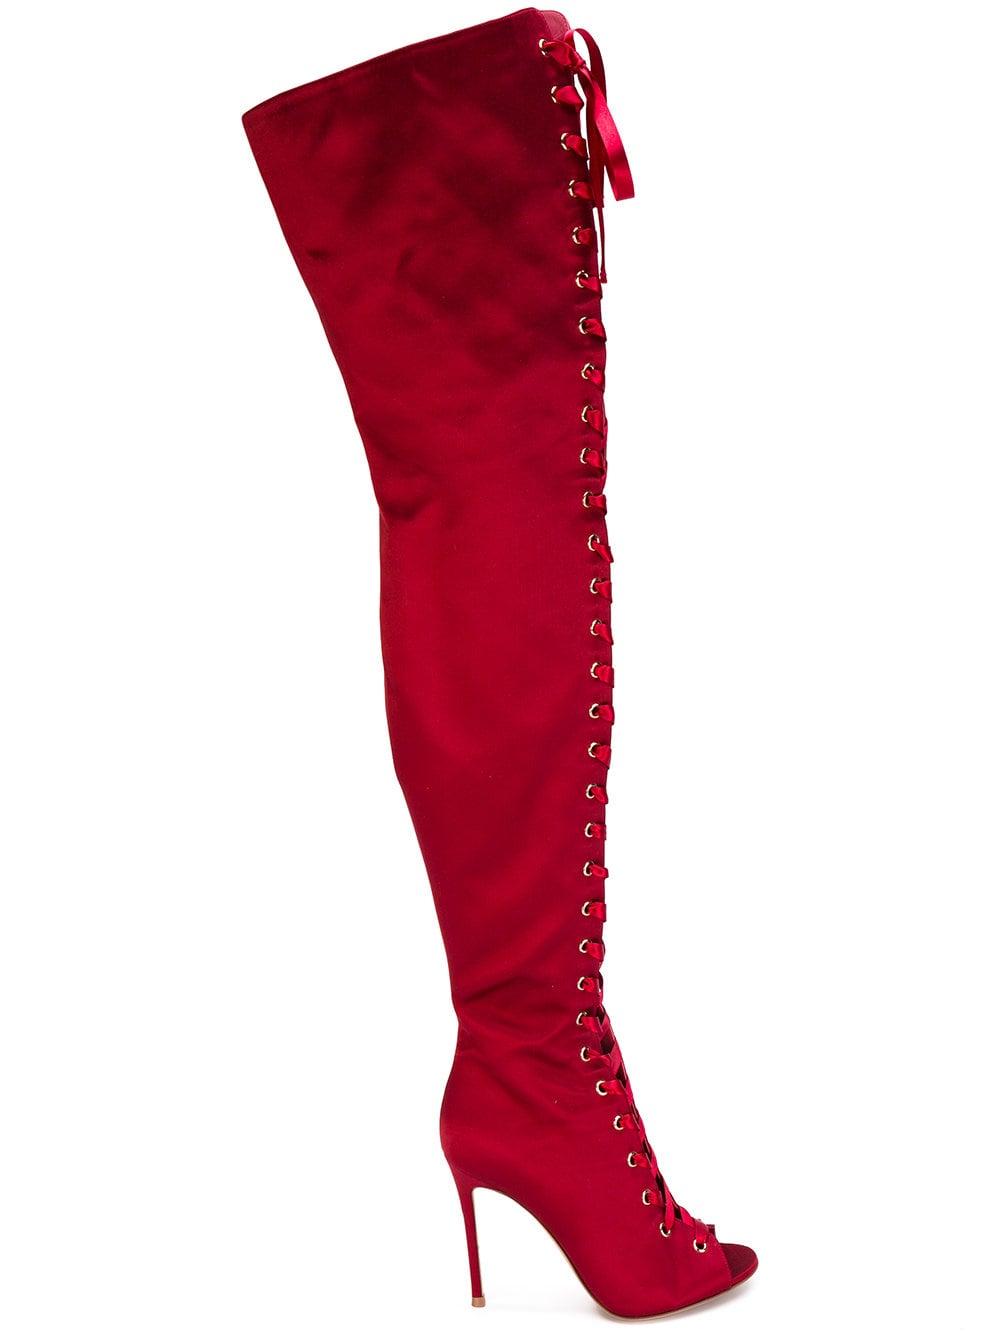 Gianvito Rossi 'Marie' Overknee-Stiefel - Rot